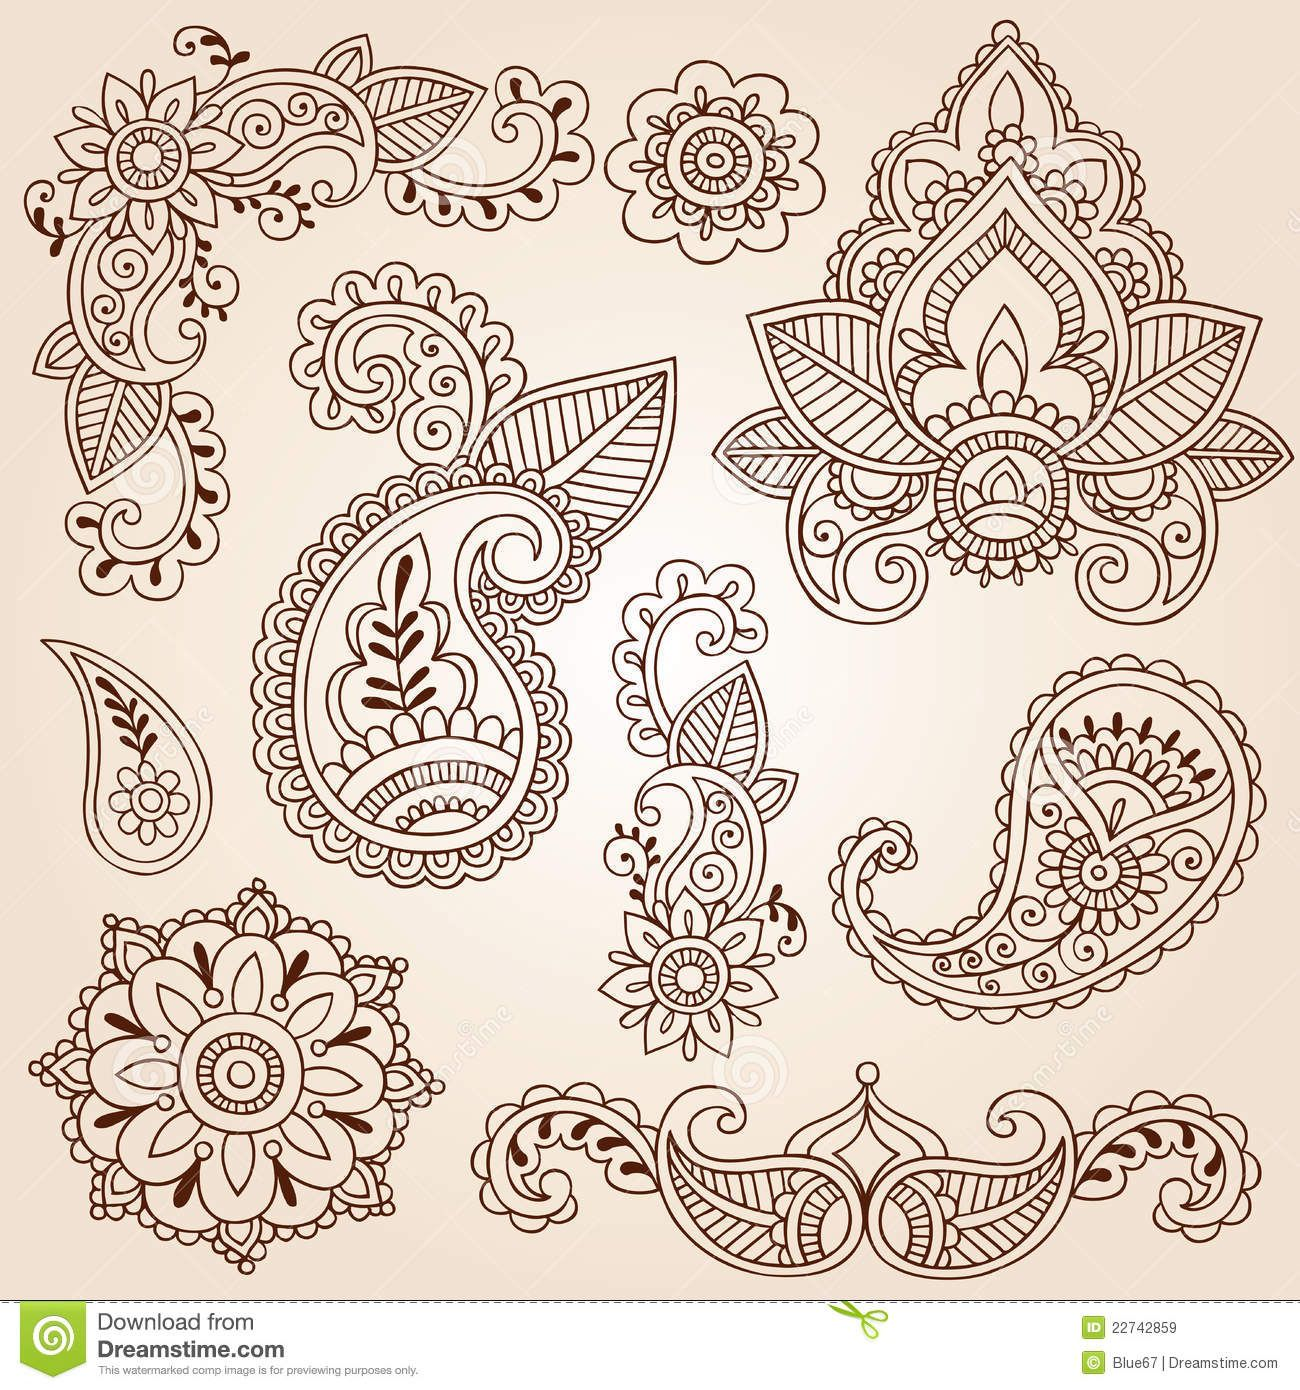 15b0aa217e3ed Free Henna Designs | henna doodles mehndi tattoo design elements set  royalty free stock